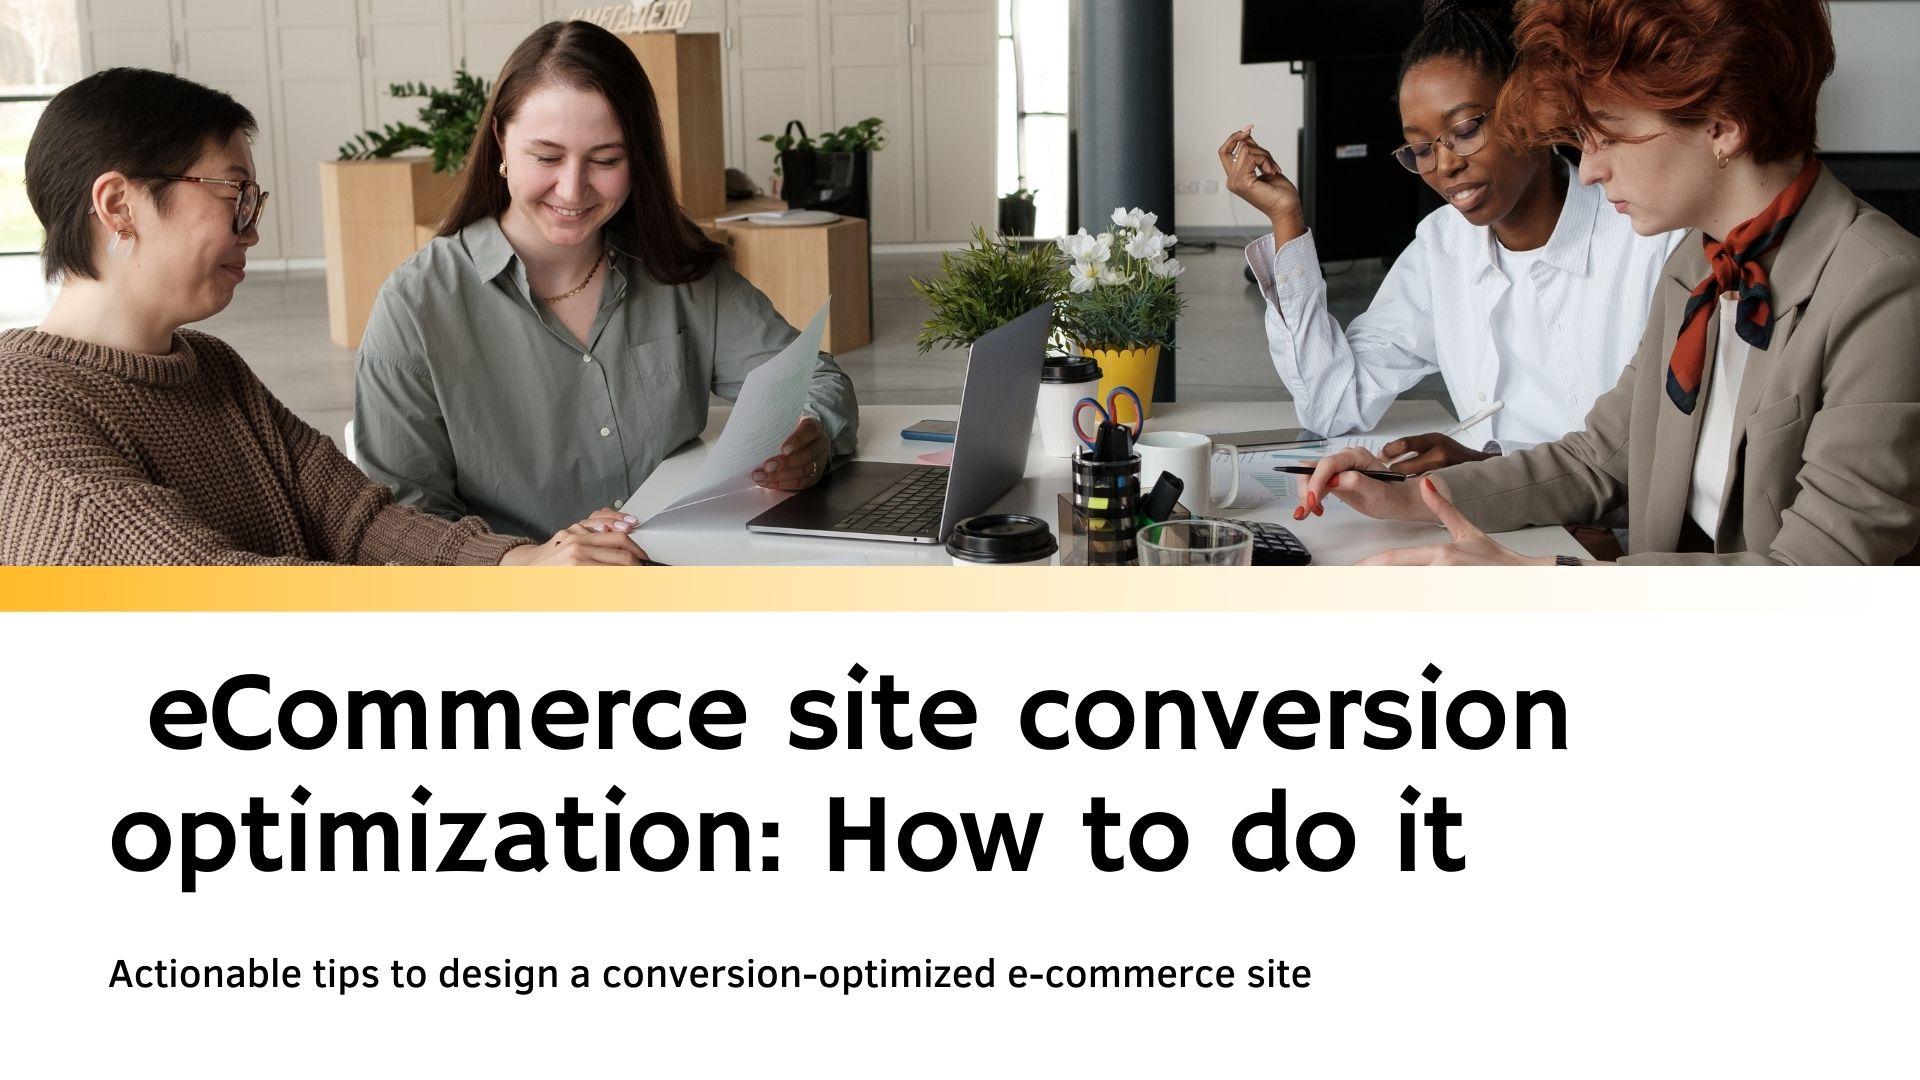 eCommerce-site-conversion-optimization